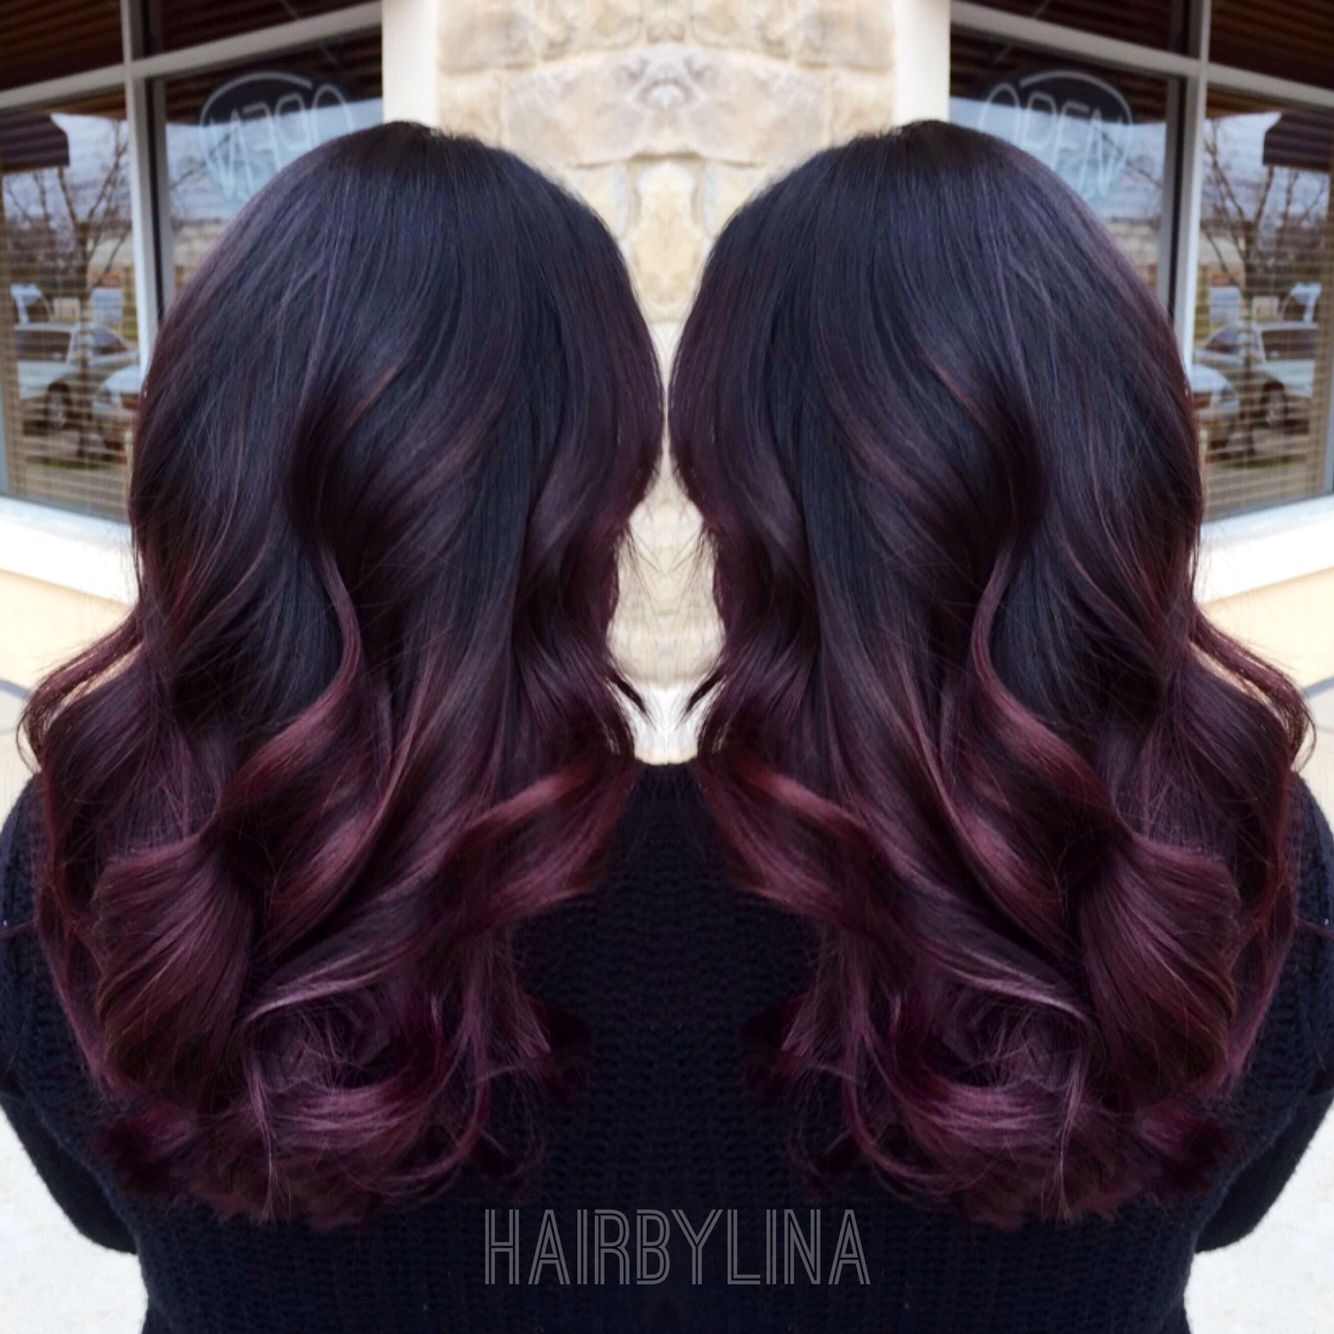 Burgundy ombre on instagram mirrormirroronthewall hair